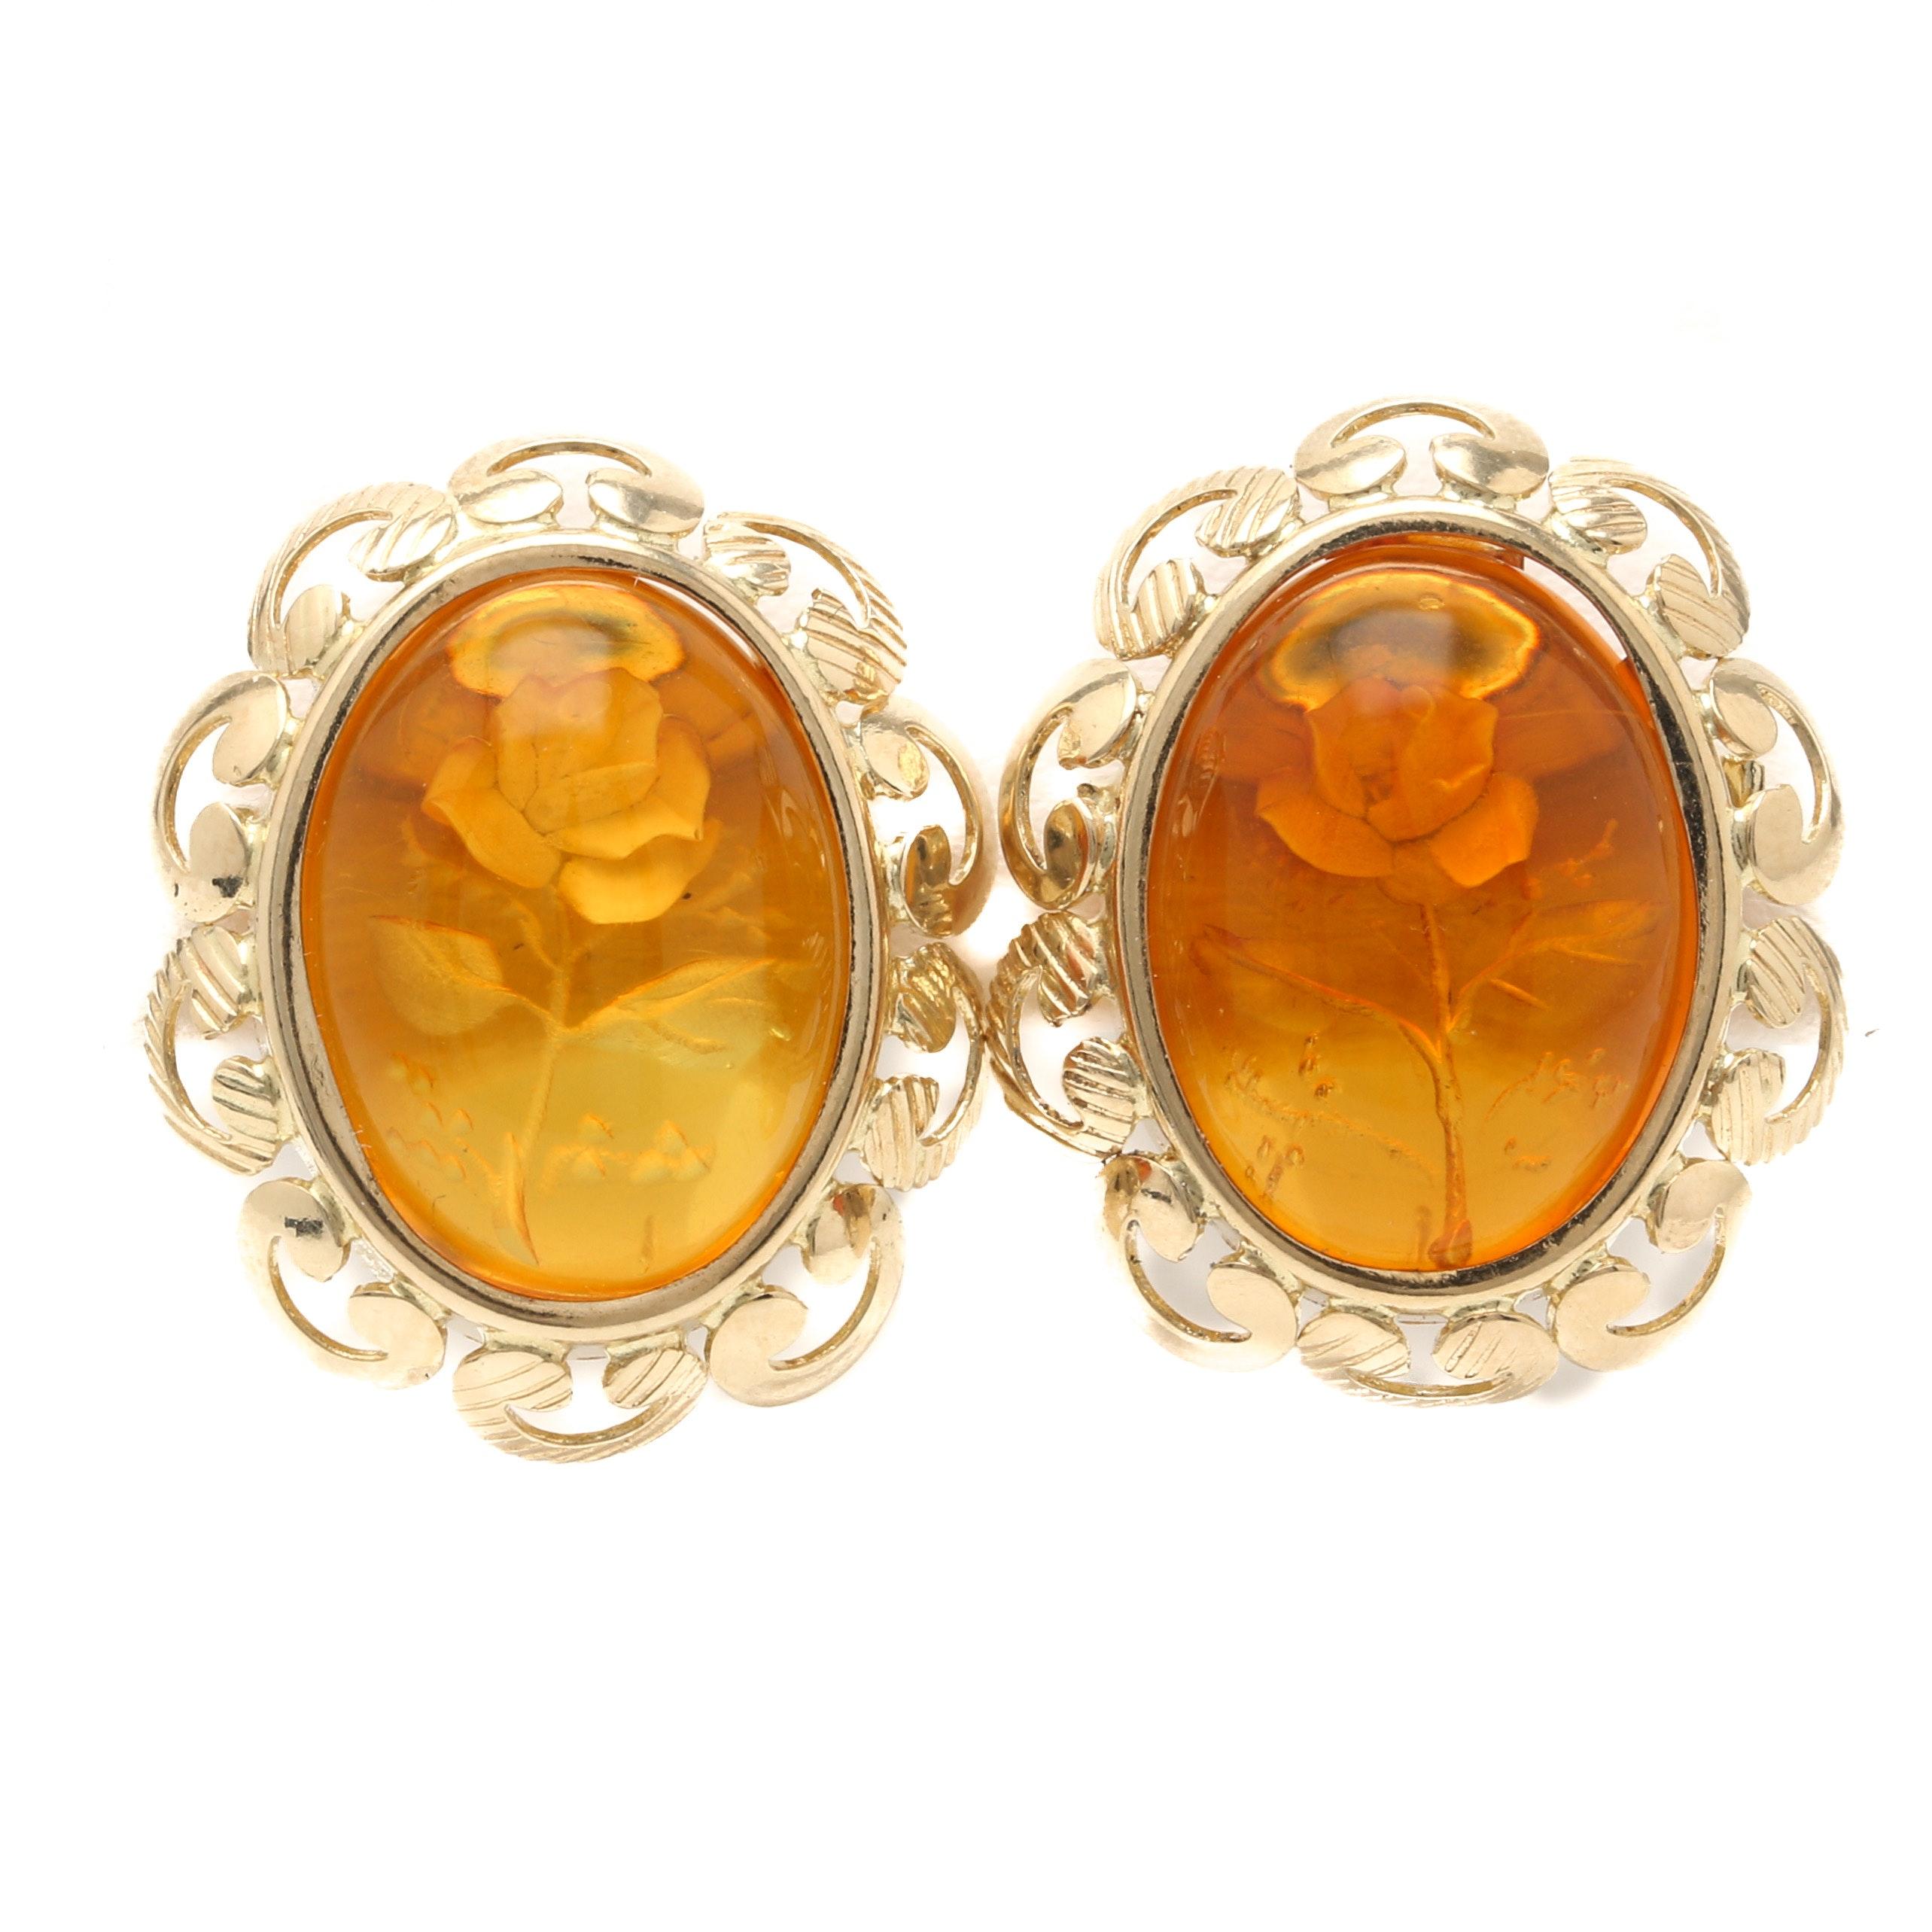 Italian 14K Yellow Gold Amber Intaglio Rose Earrings